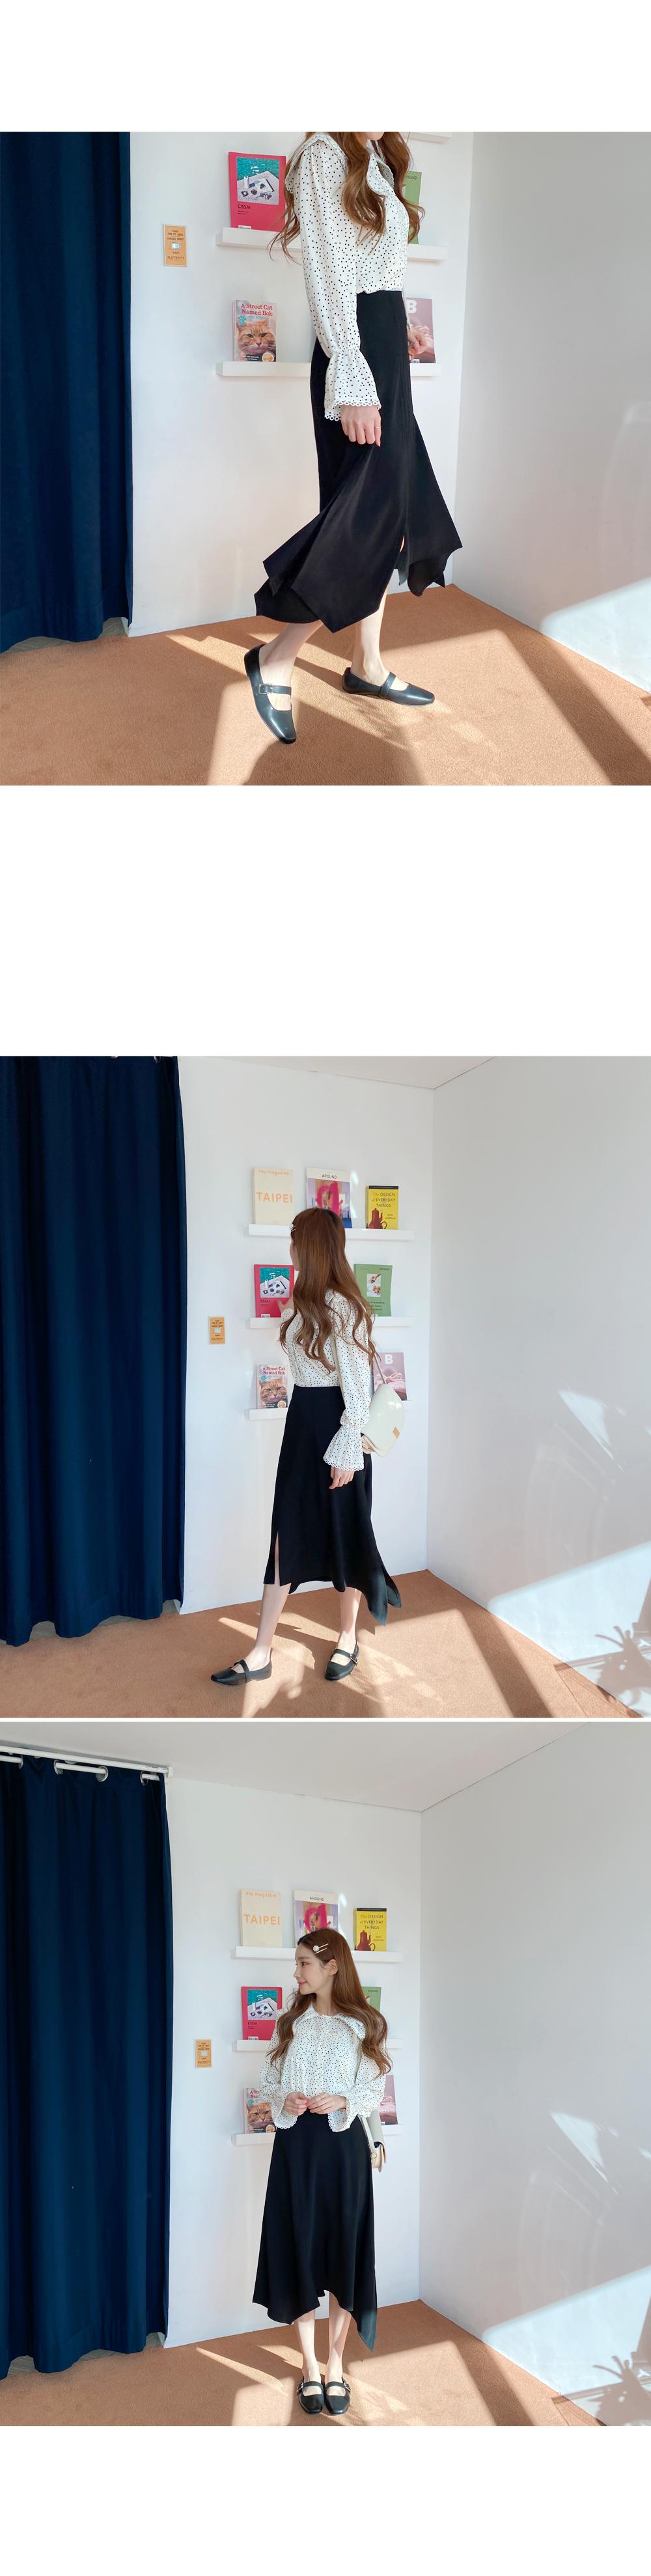 One step two steps tom long skirt